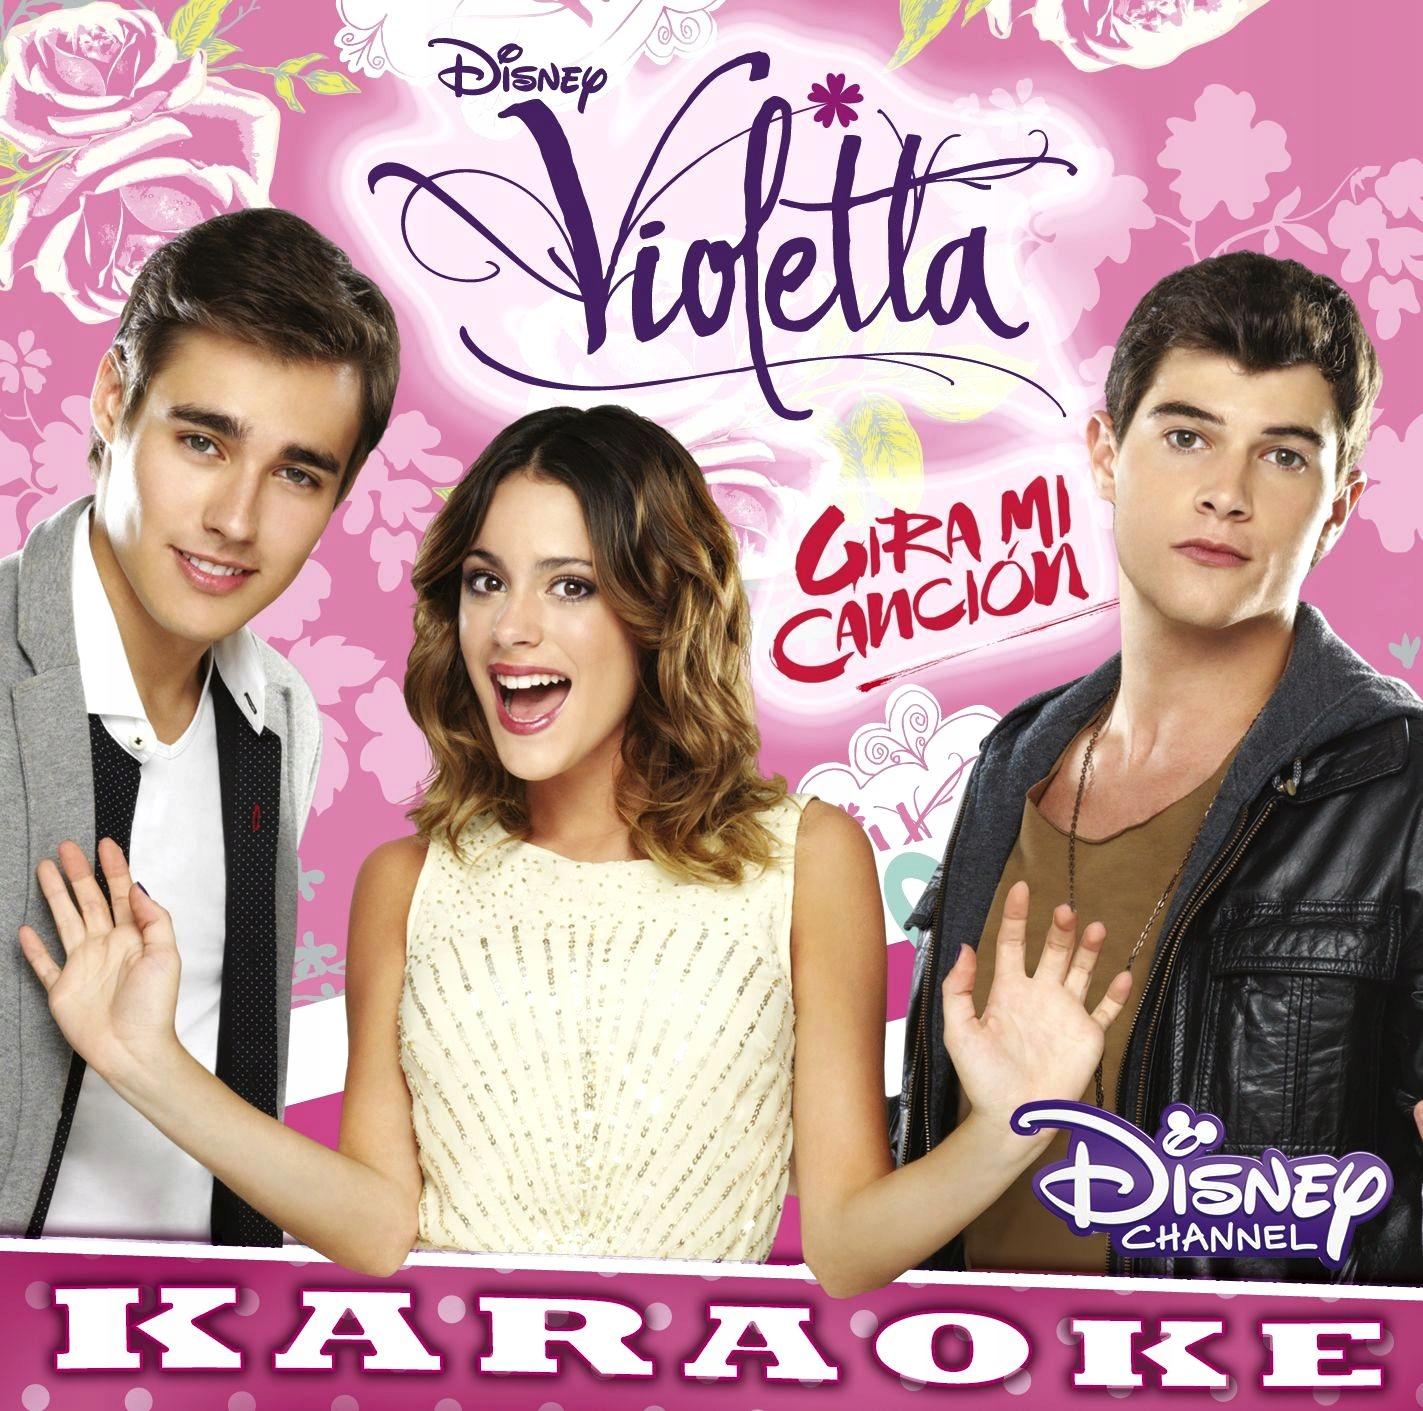 VIOLETTA Girami Cancion 3 KARAOKE Disney ŚPIEWAJ